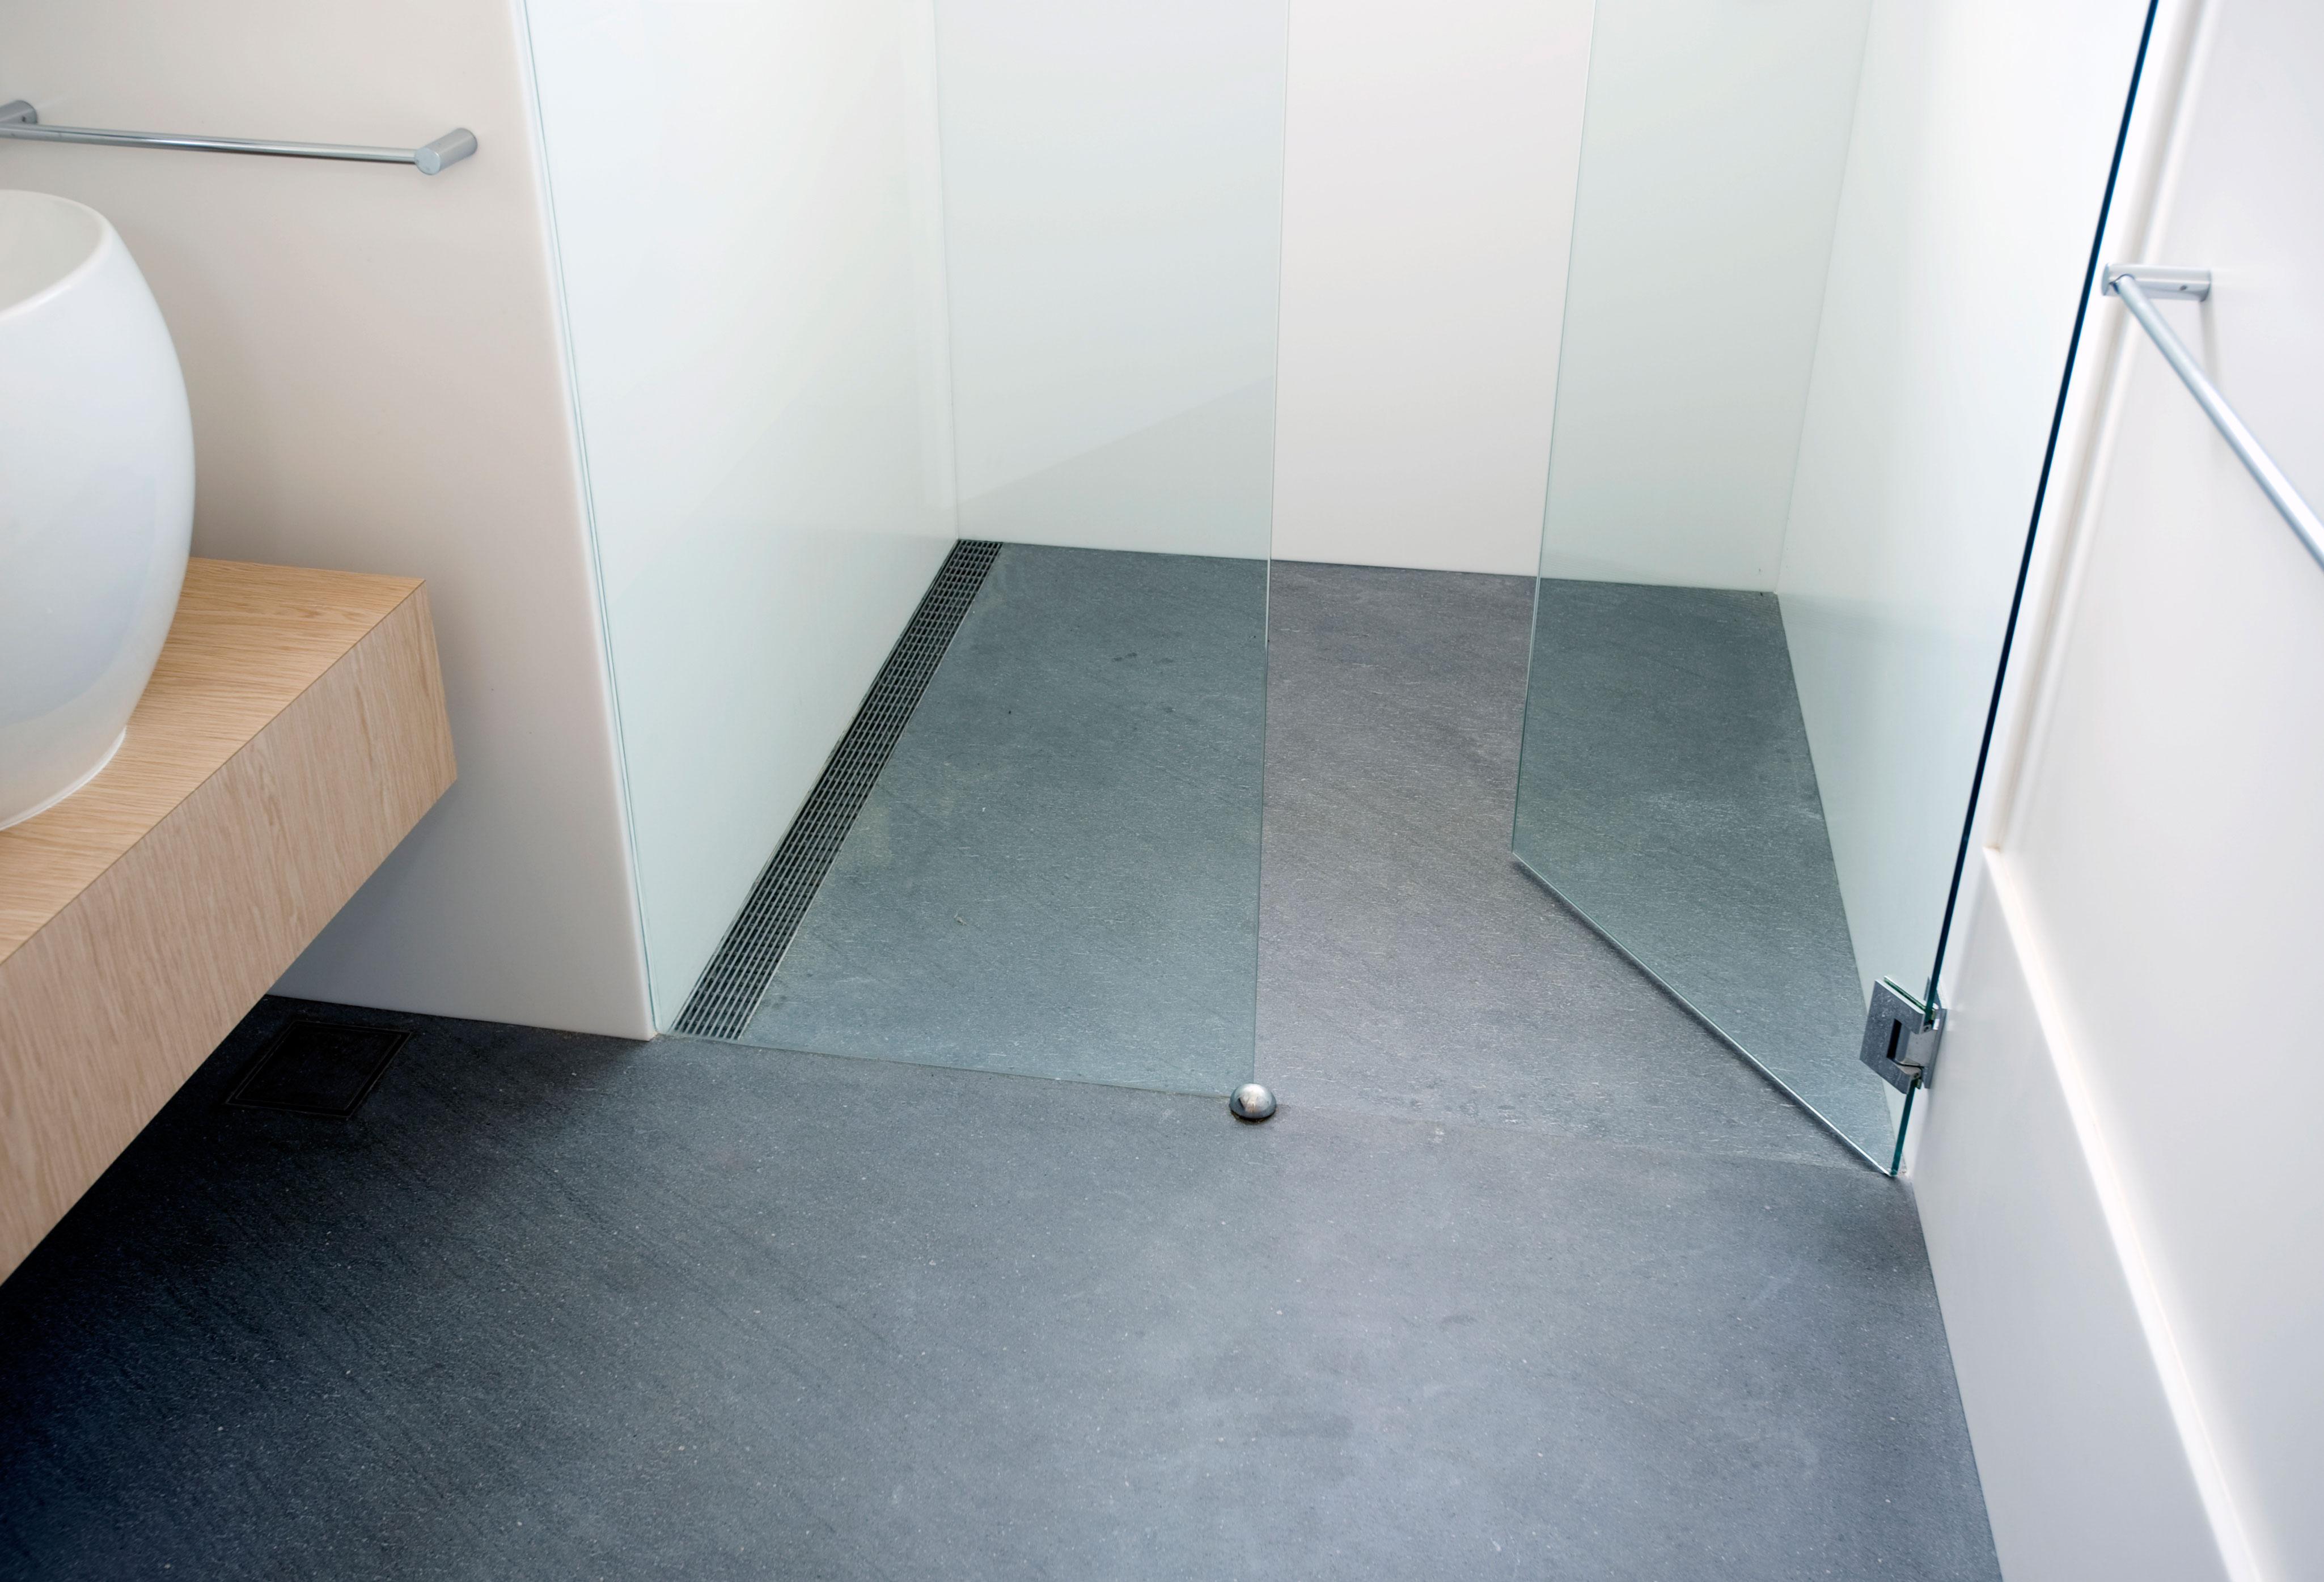 Stupendous Barrier Free View Linear Drains Barrier Free Linear Shower Drain Bronze Linear Shower Drain Install houzz-02 Linear Shower Drain